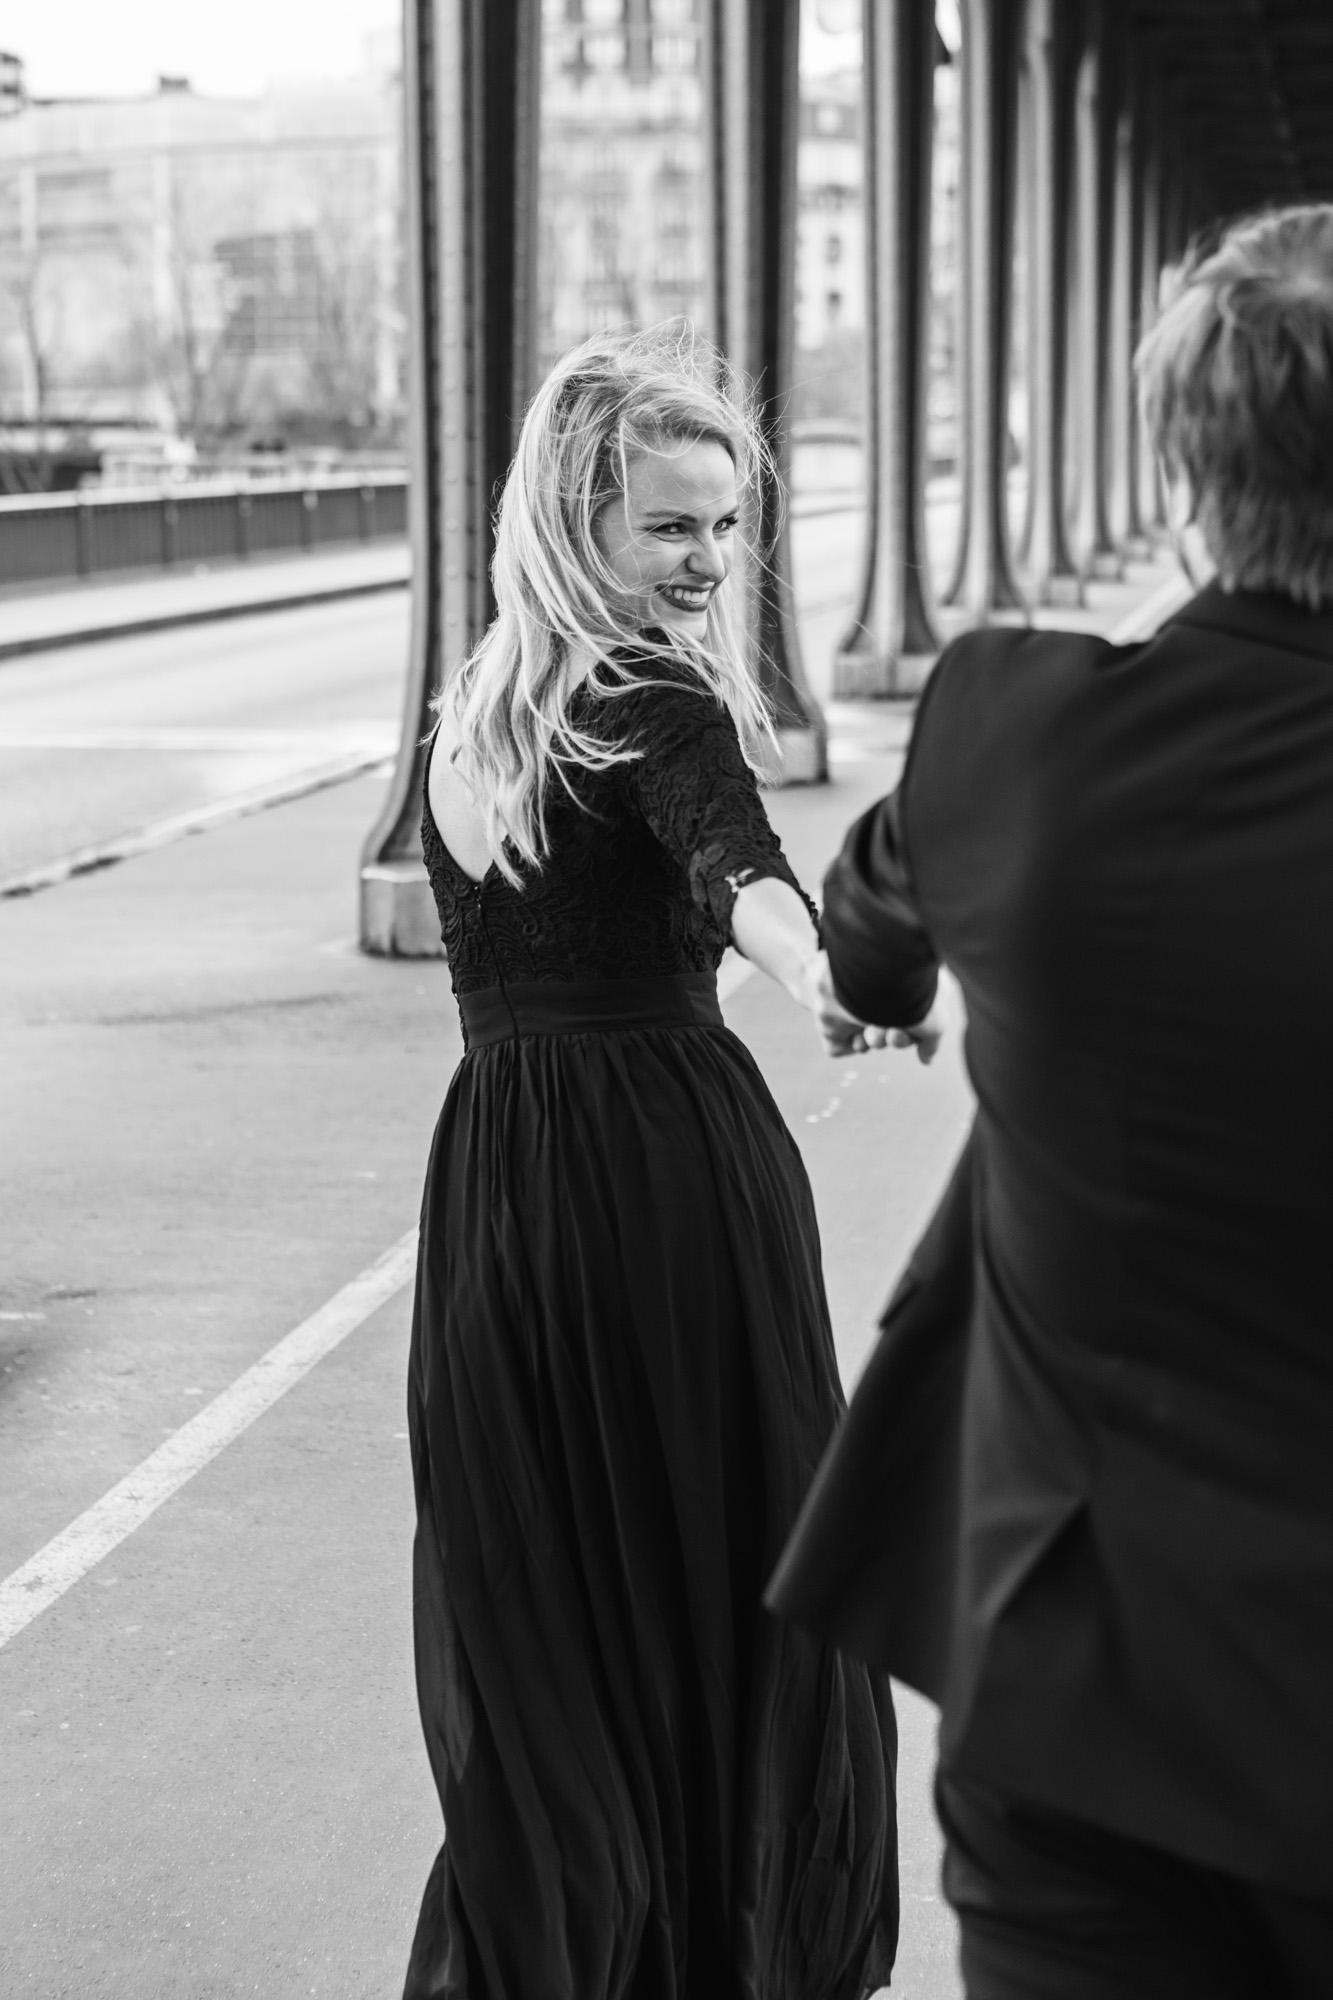 Paris Photographer Federico Guendel captured couple engagement portrait in black and white at Pont Bir Hakeim